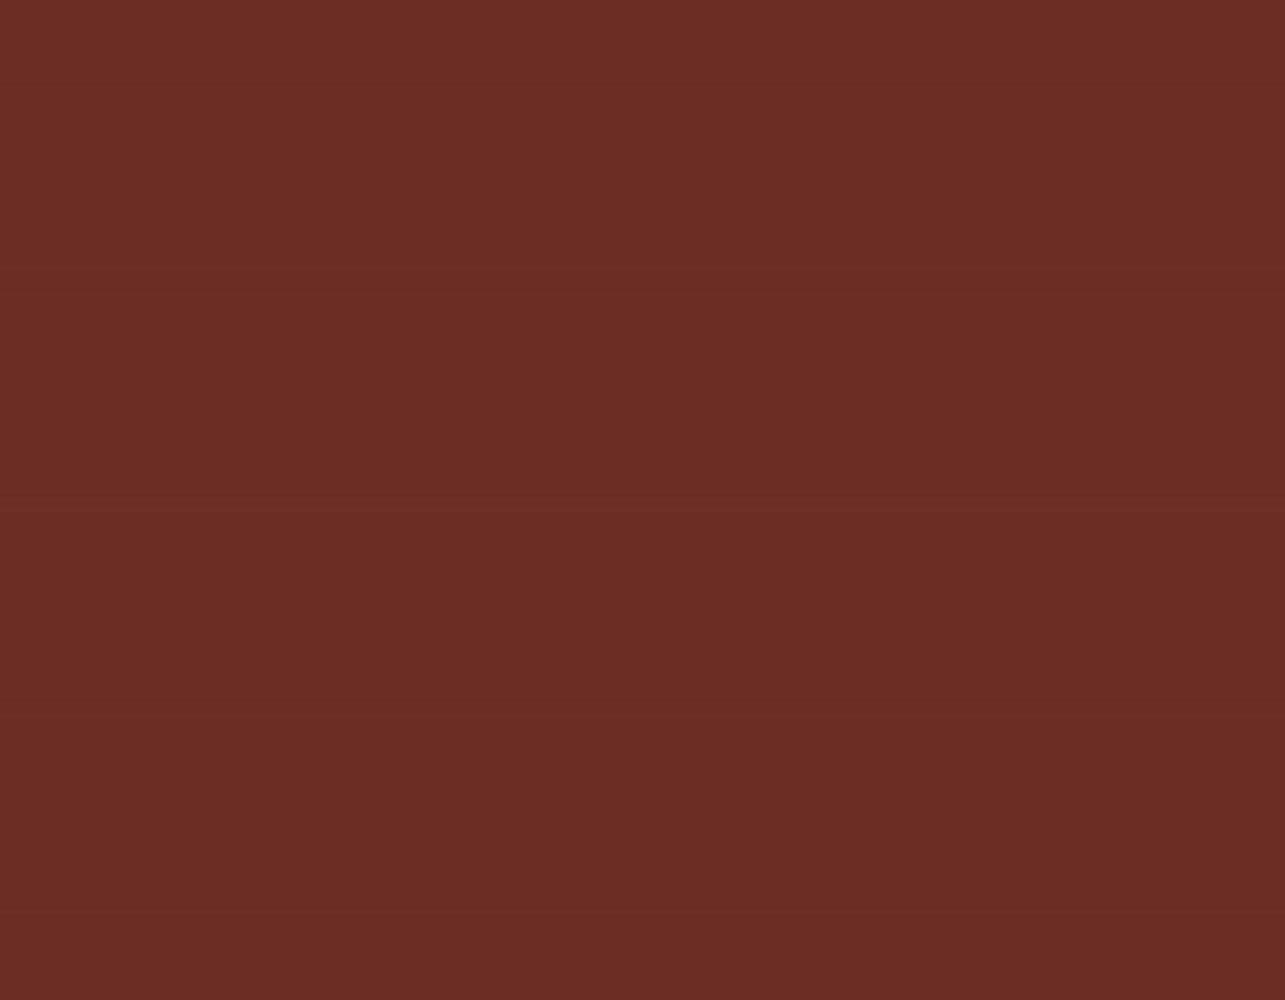 Kraft Tool RA550 Powder Release Agent for Kraft Texture Mats, Brick Red